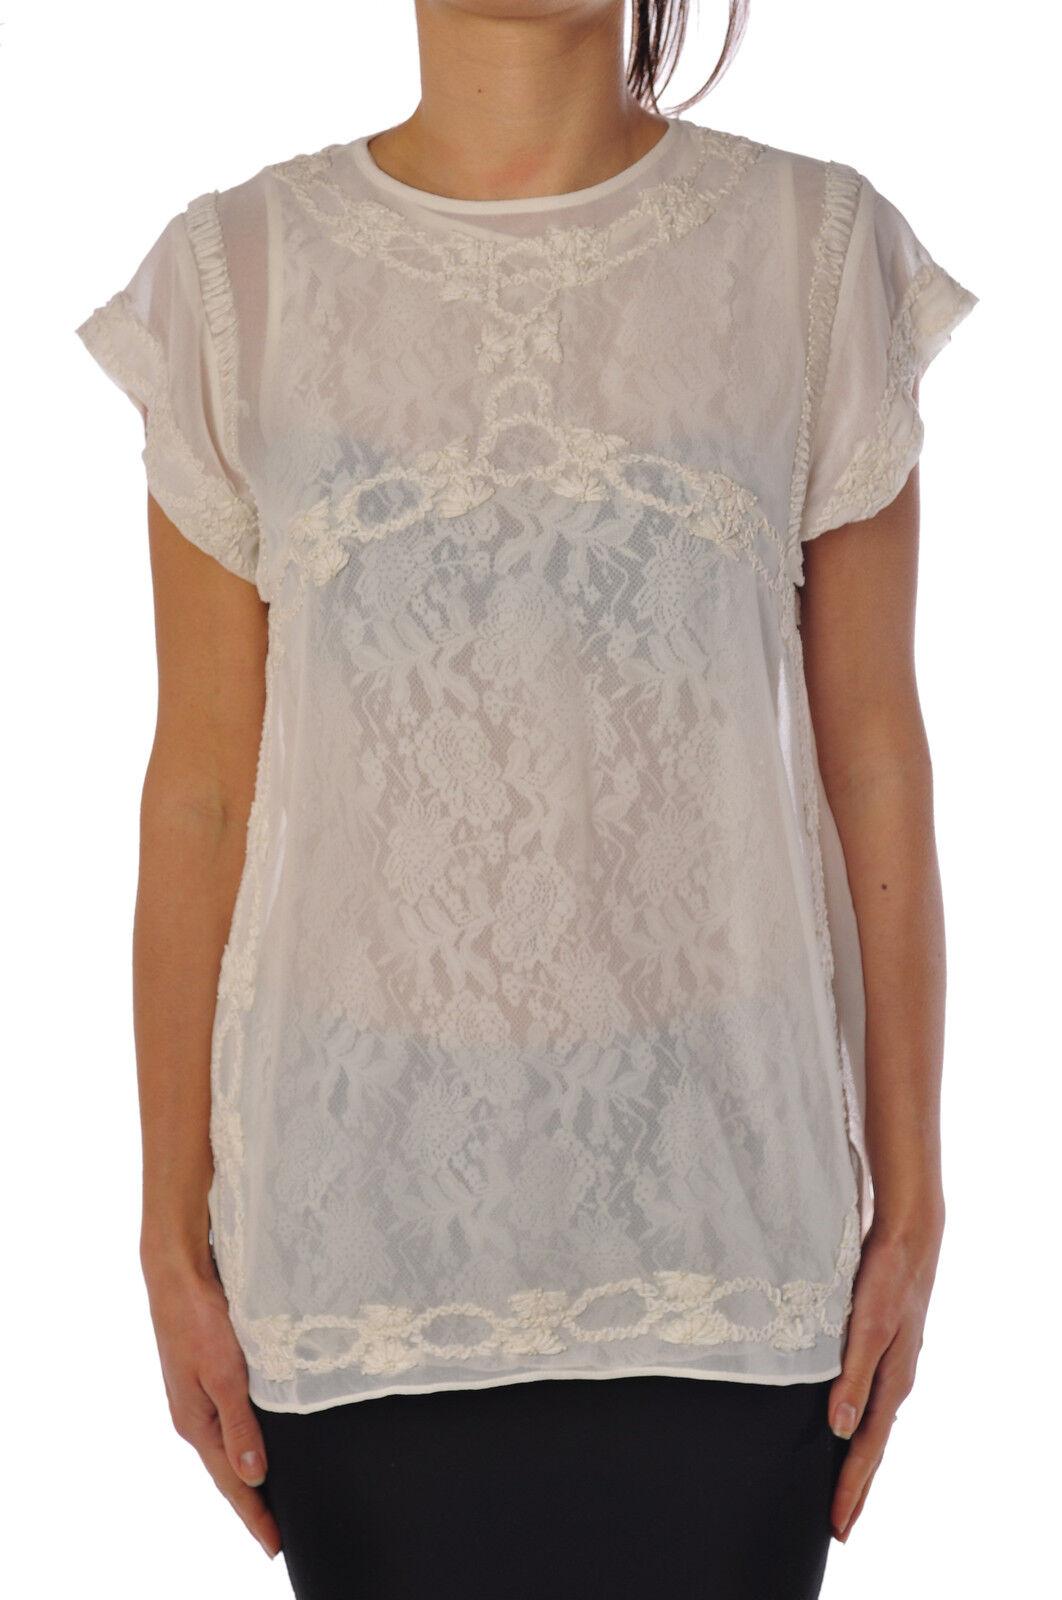 Twin Set  -  Blouses - Female - S - White - 1247326A165329